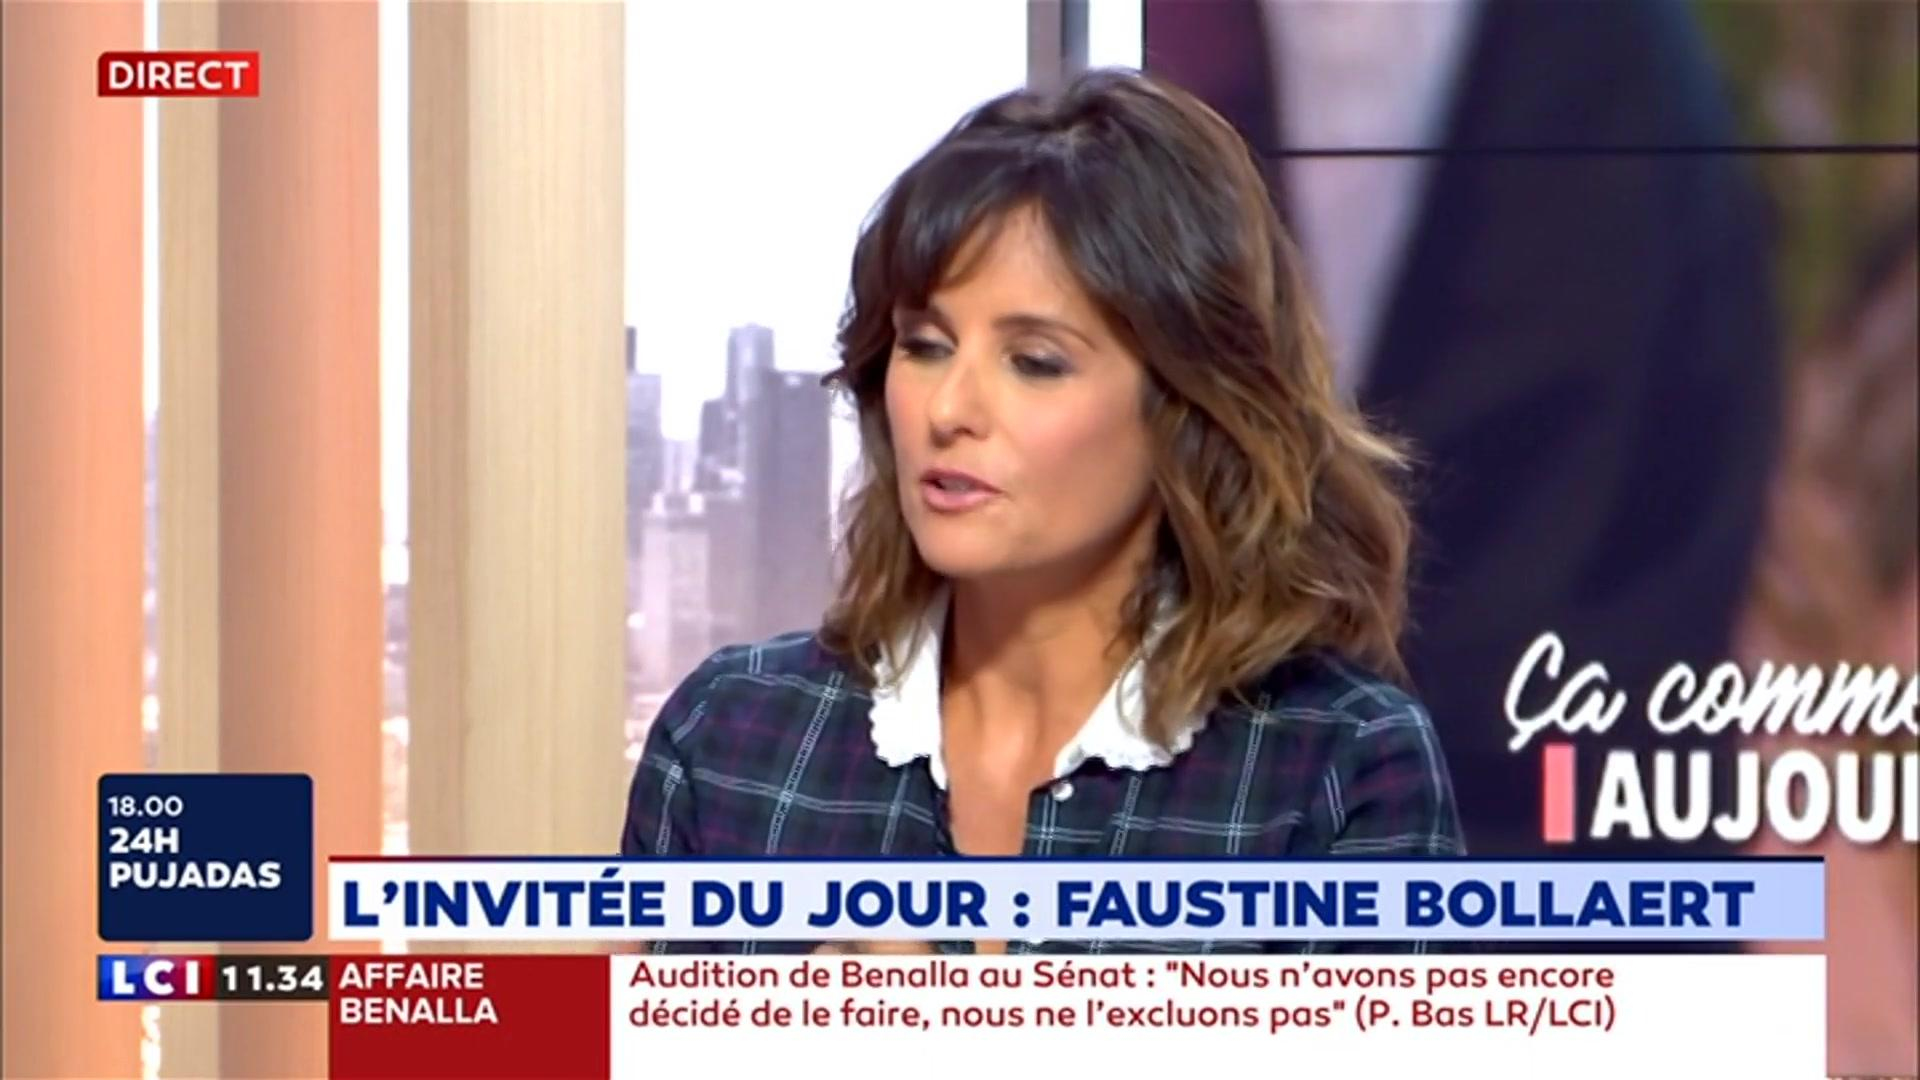 Faustine Bollaert Nude Photos 26